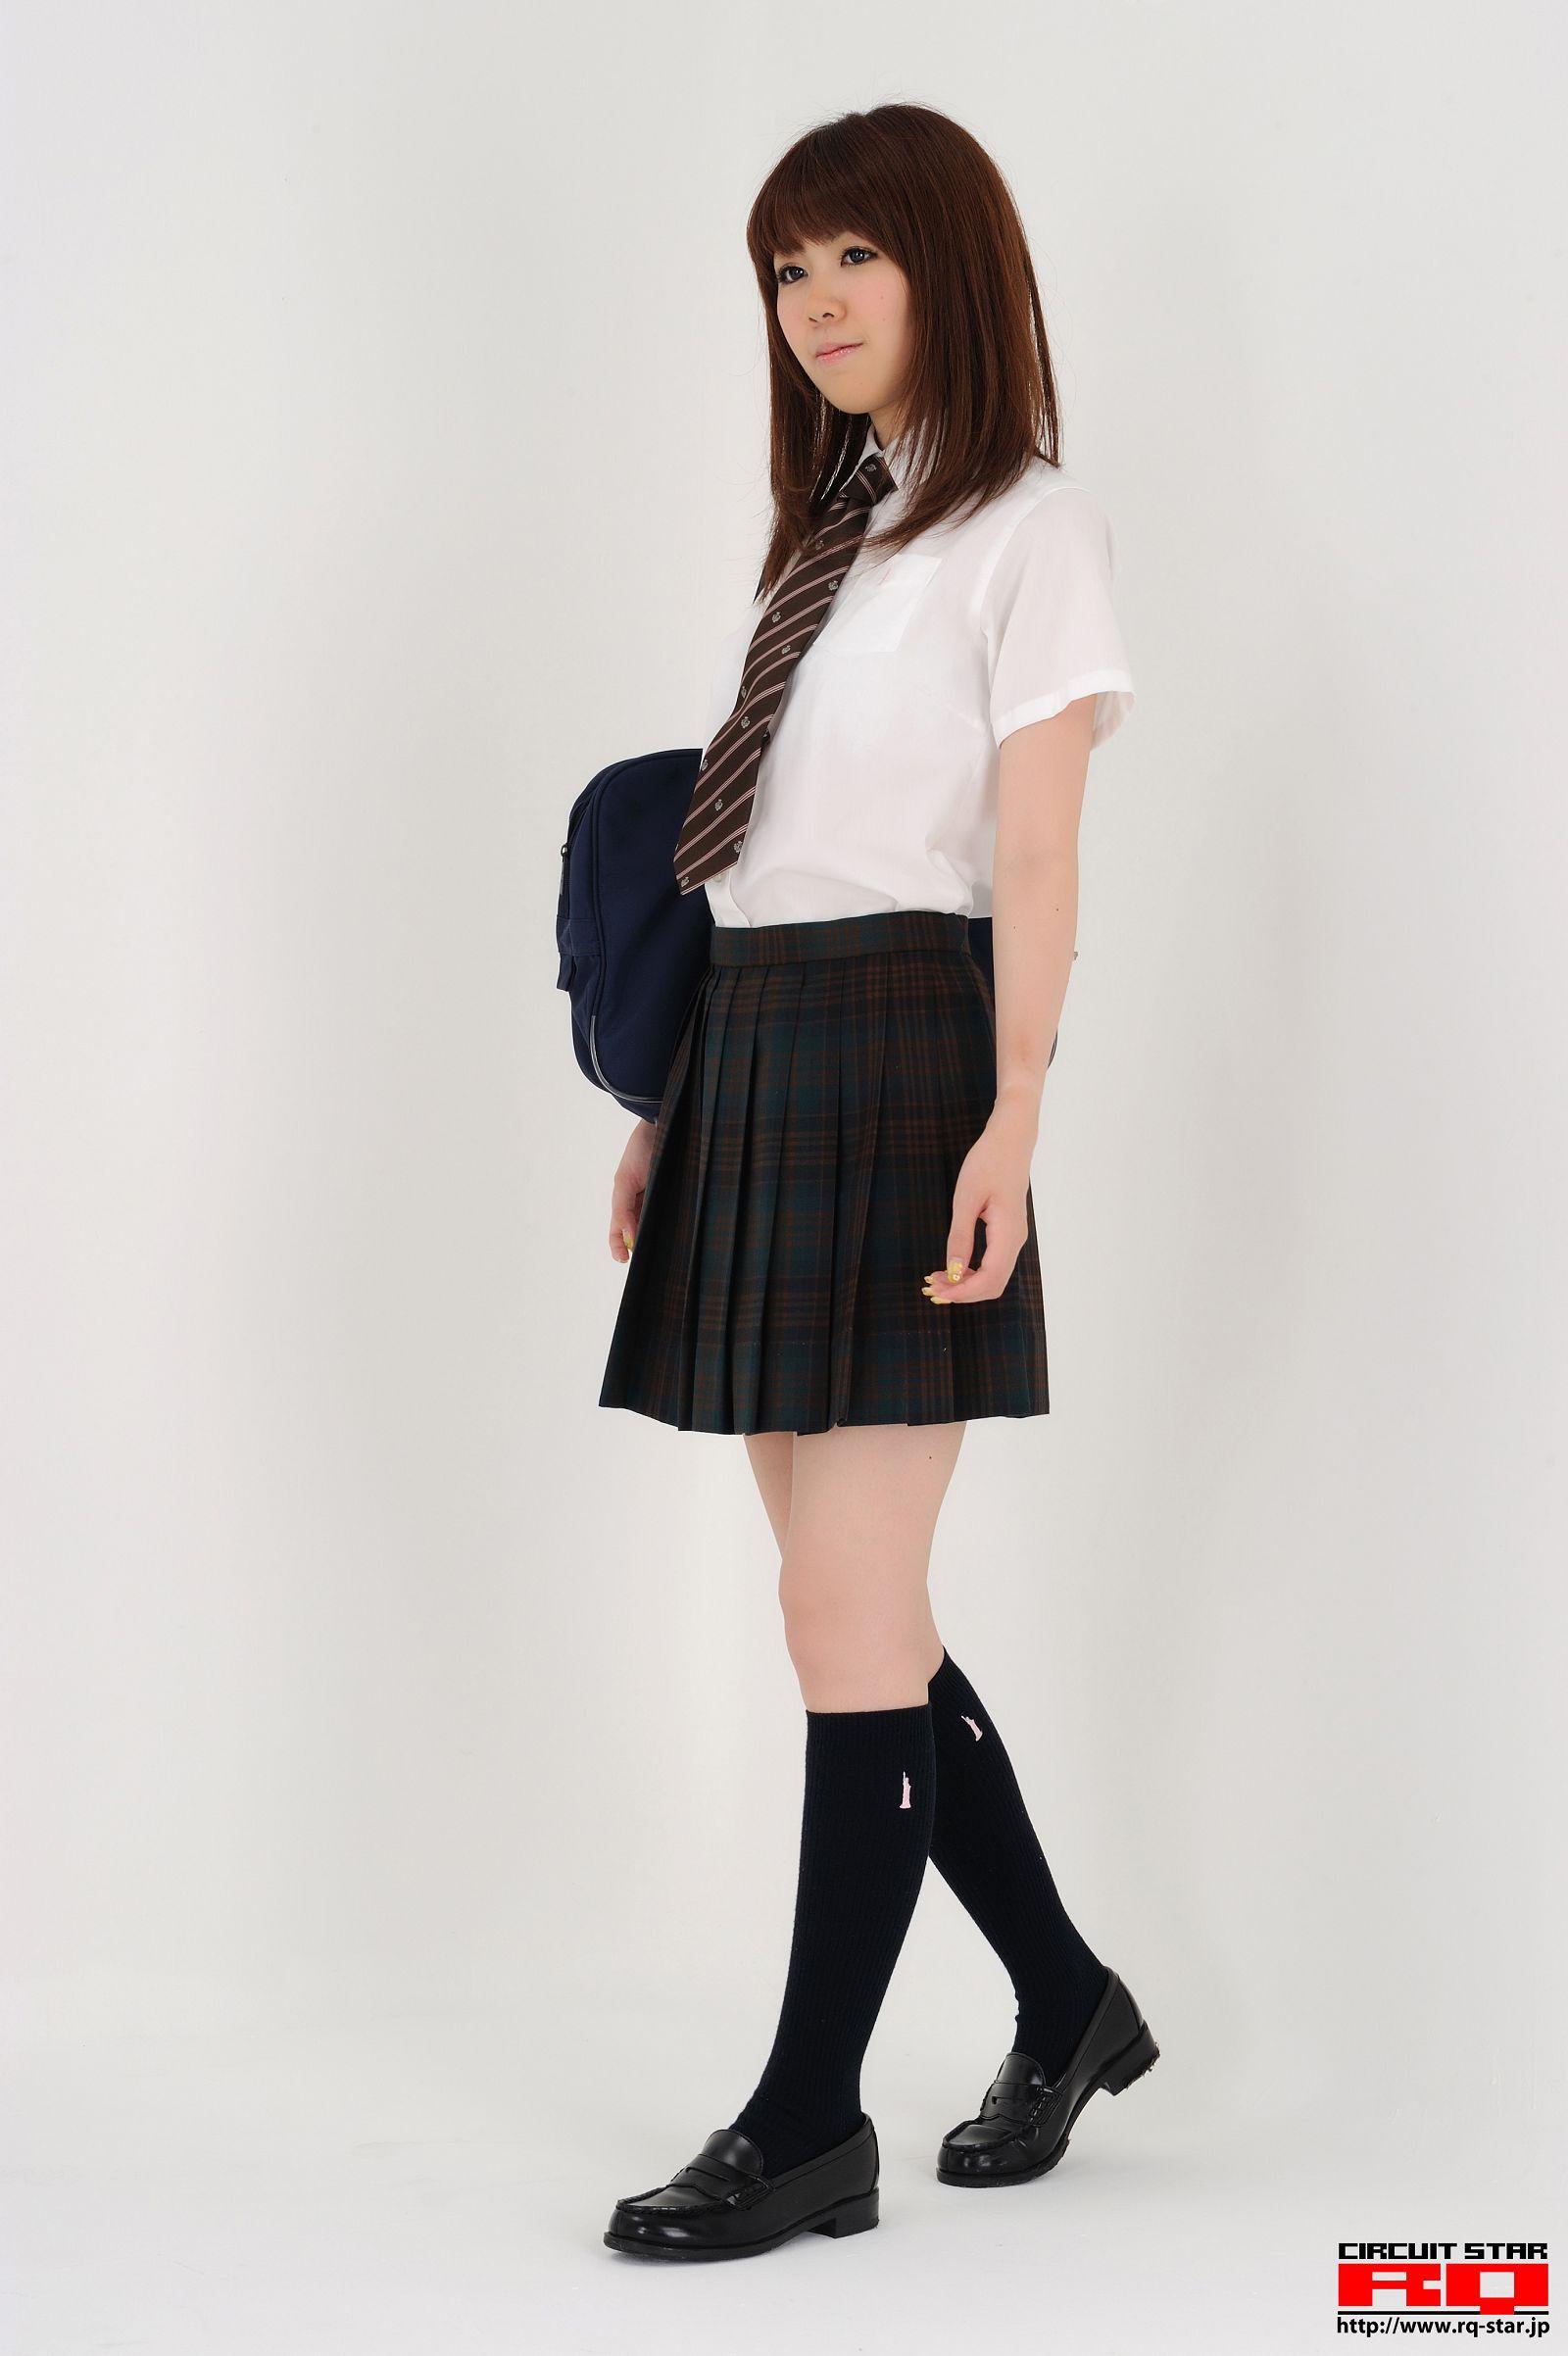 [RQ STAR美女] NO.0378 Haruka Ikuta 生田晴香 School Girl[119P] RQ STAR 第1张